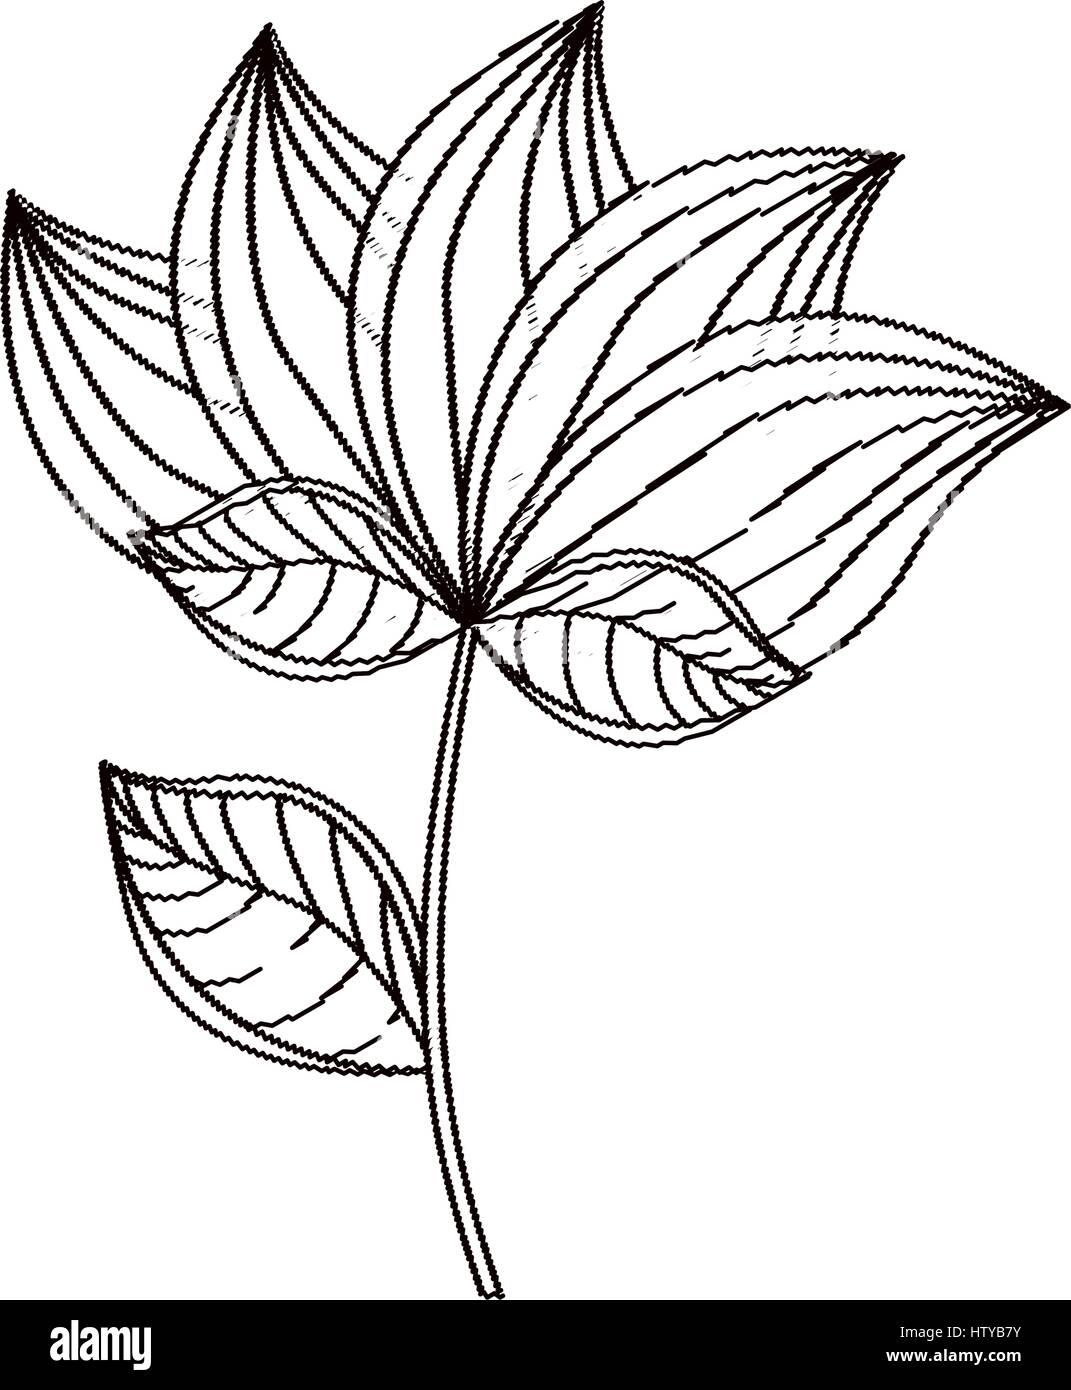 Lotus flower decoration sketch stock vector art illustration lotus flower decoration sketch izmirmasajfo